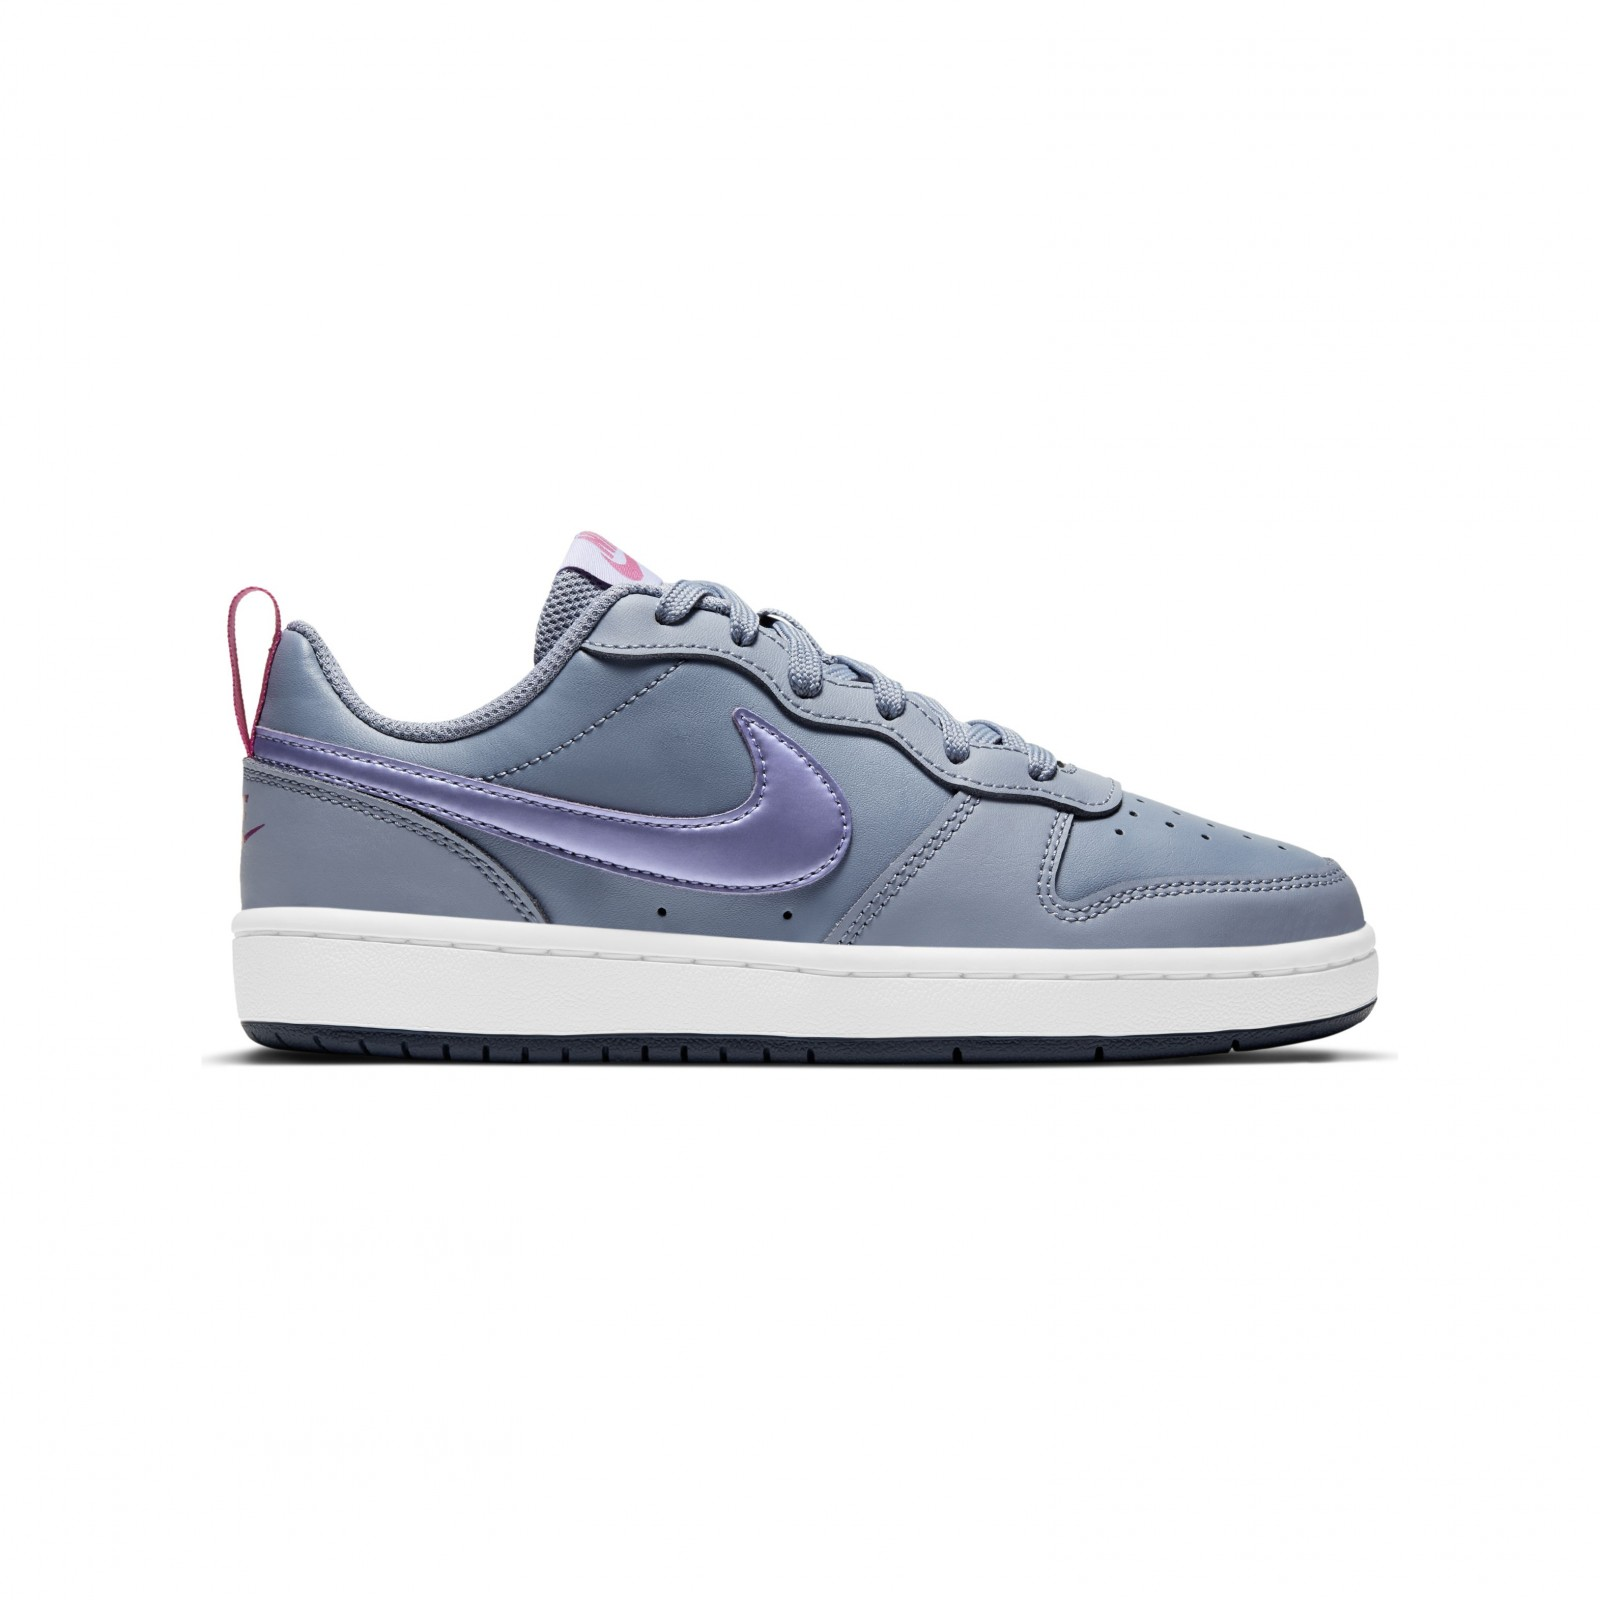 Nike Court Borough Low 2 ASHEN SLATE/PURPLE PULSE-FIREBERRY